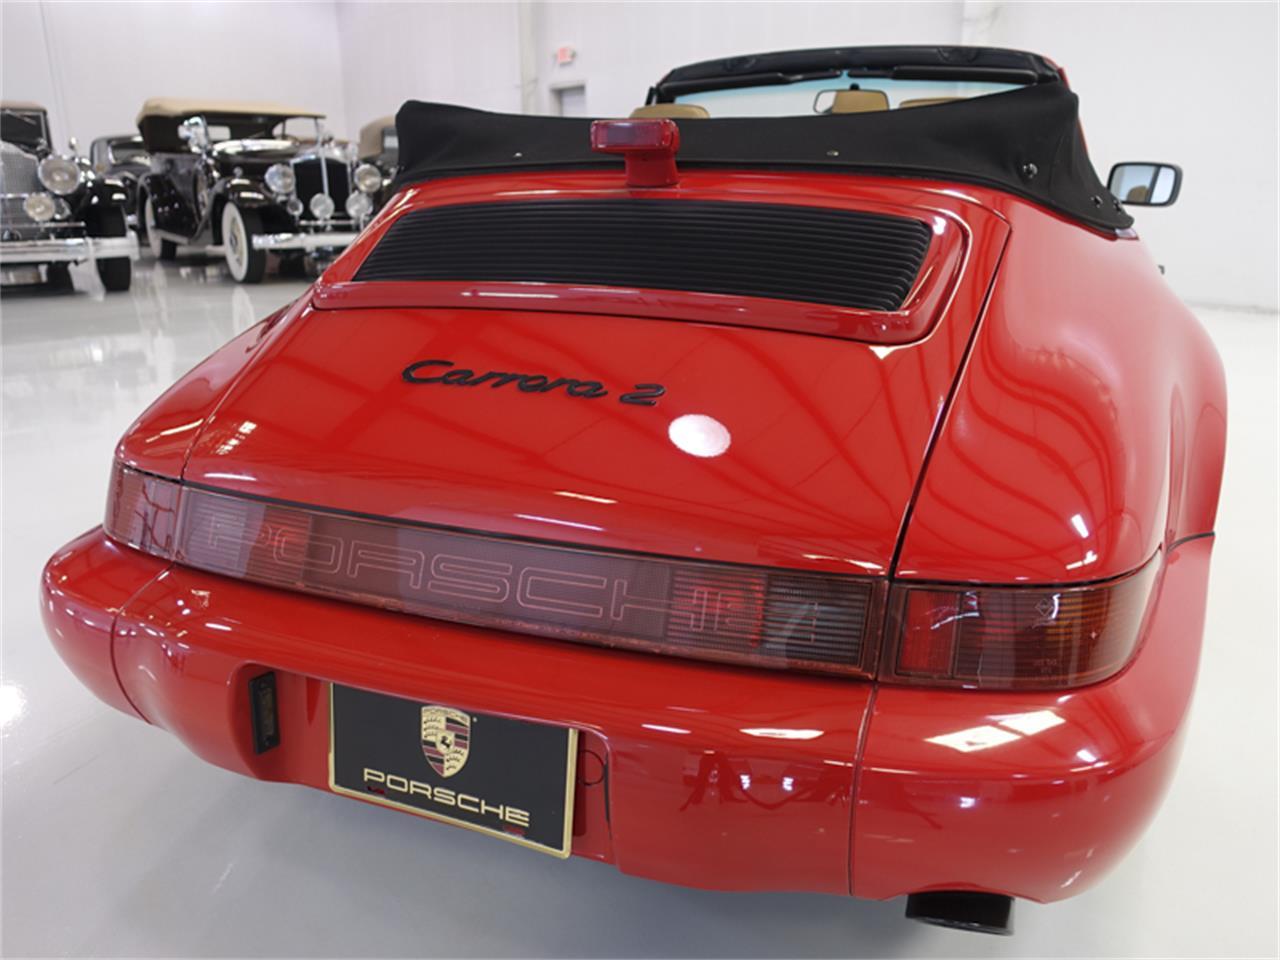 1990 Porsche 964 Carrera 2 (CC-1207435) for sale in Saint Louis, Missouri